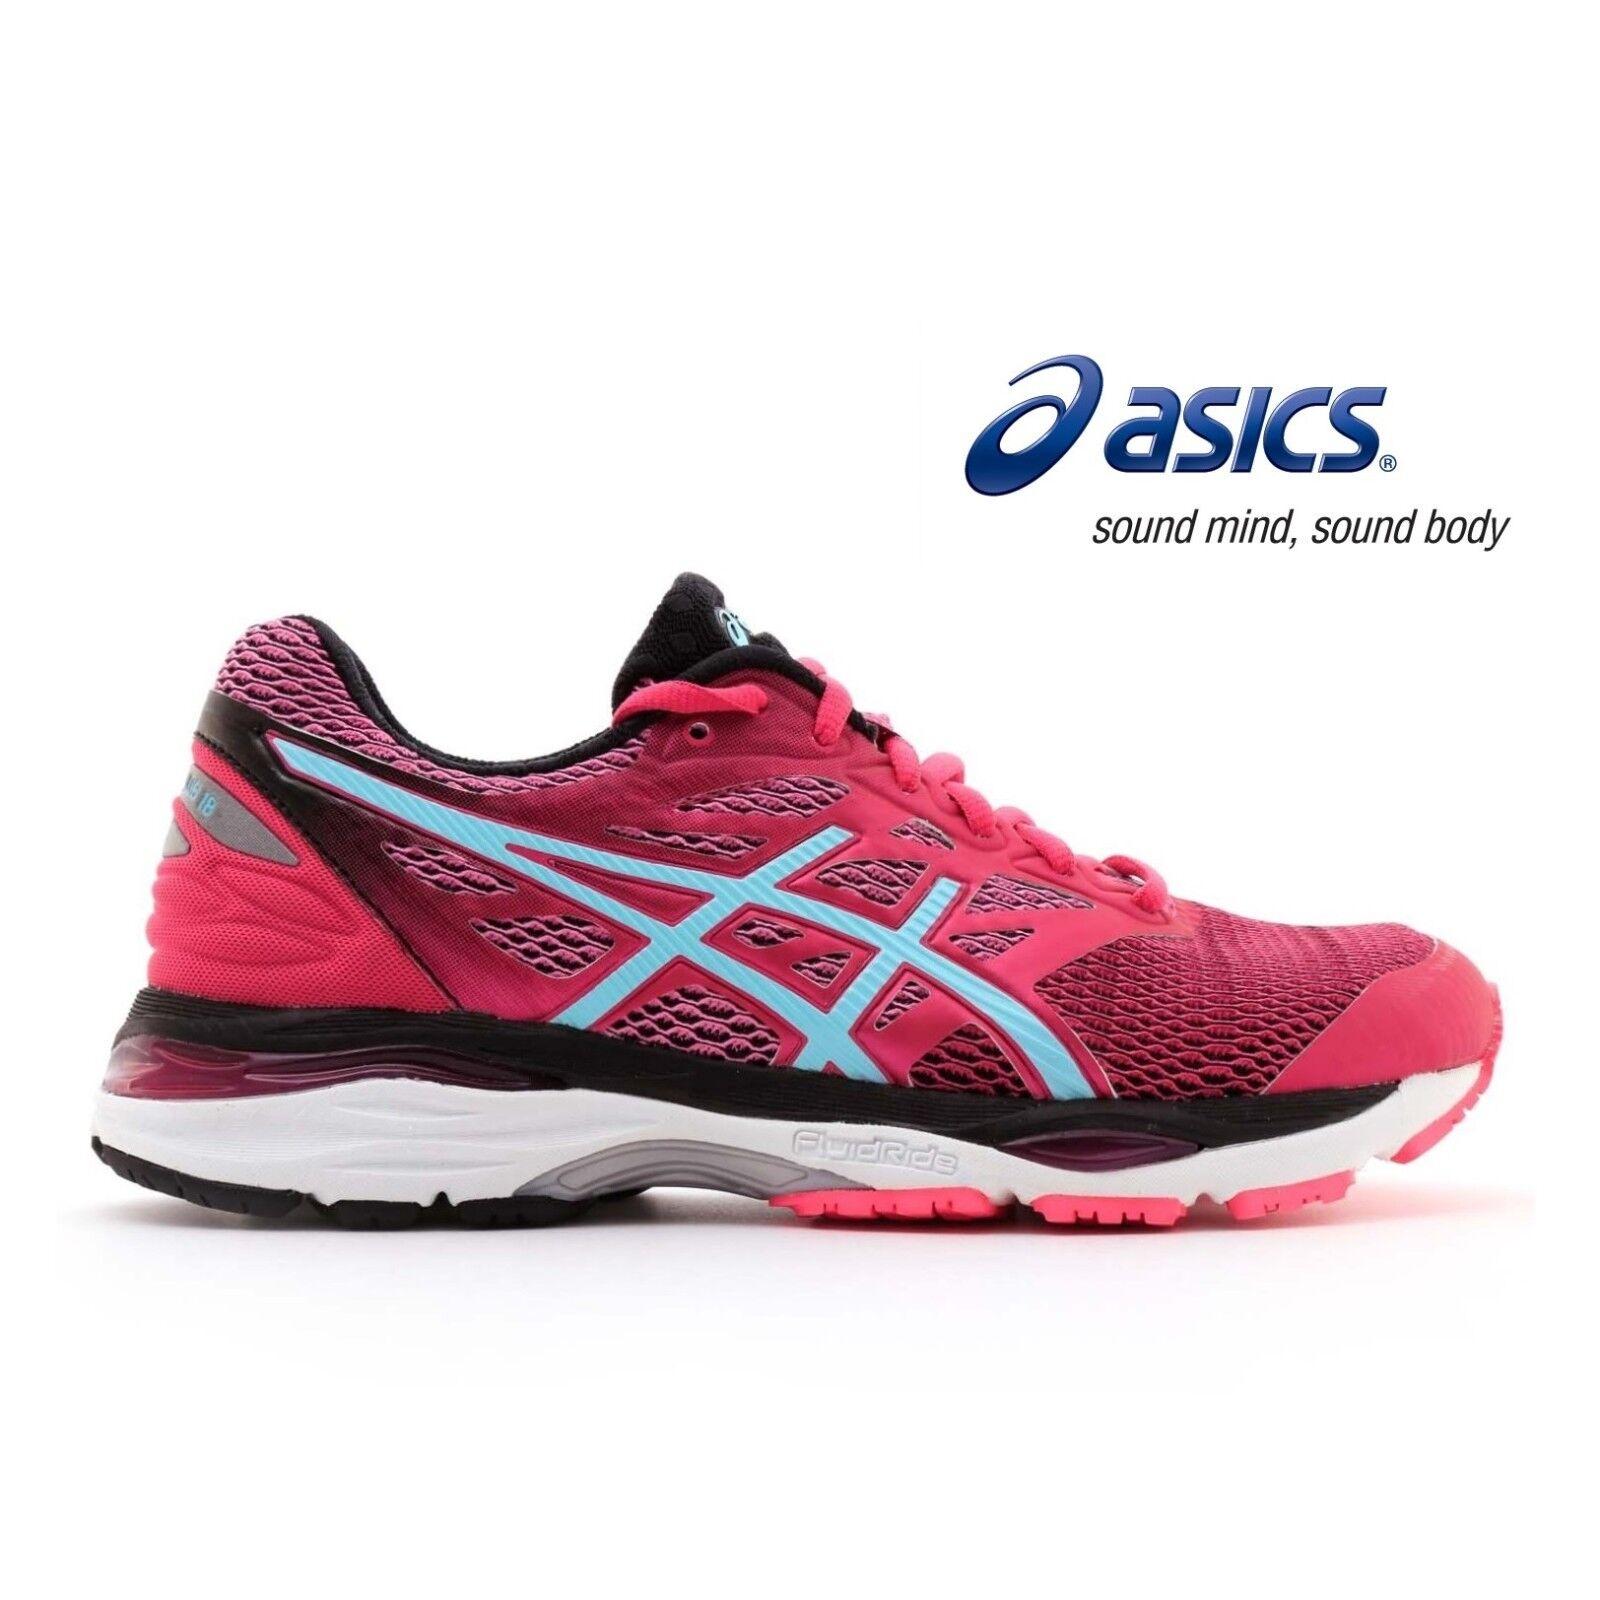 ASICS ginnastica Gel Cumulus 18 scarpe ginnastica ASICS donna trail running fucsia T6C8N 1978 932681